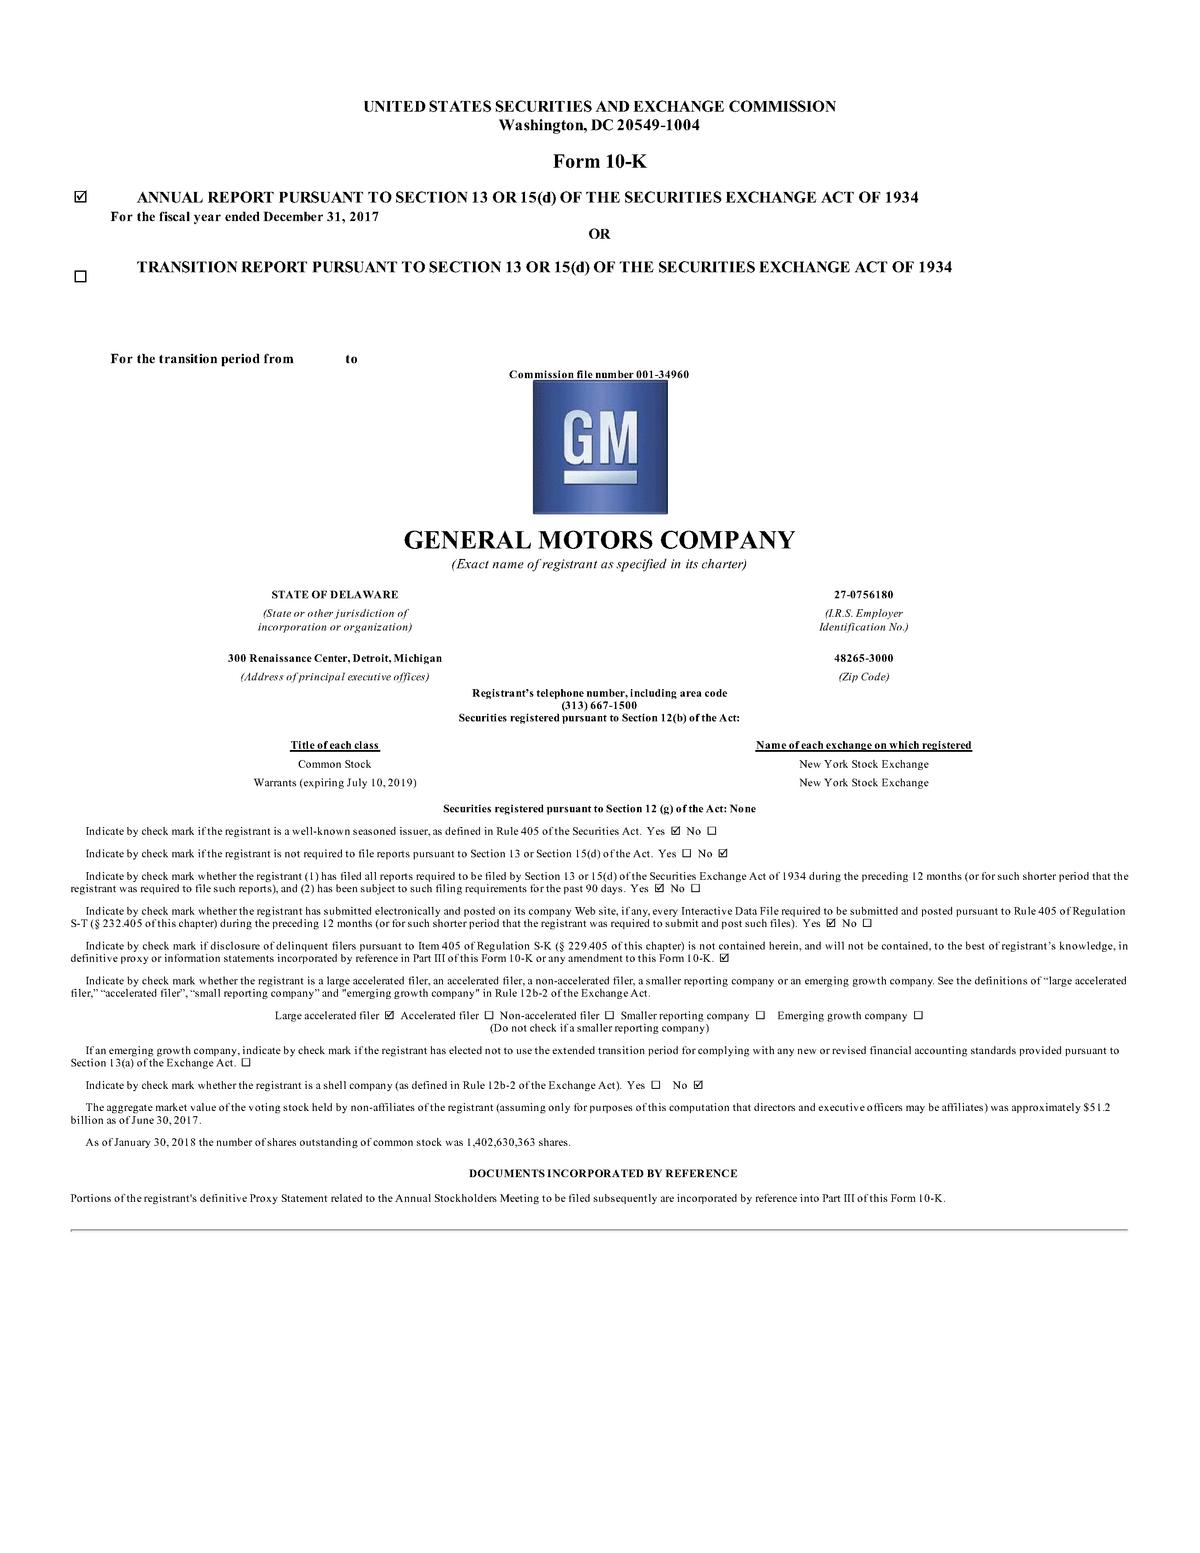 GM 2017 - AC301: Advanced Accounting - StuDocu